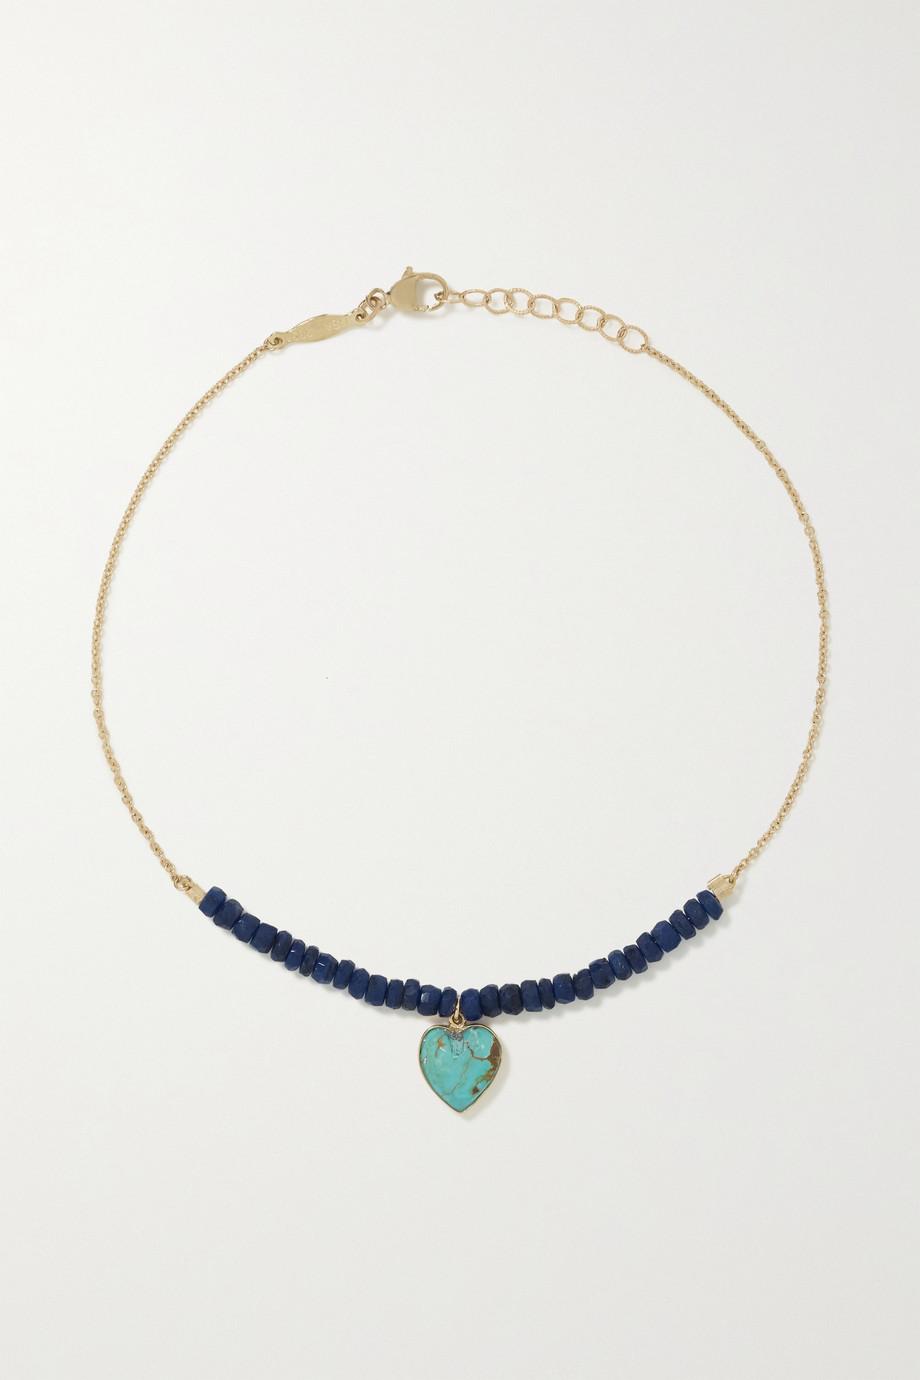 Jacquie Aiche 14-karat gold, lapis lazuli and turquoise anklet